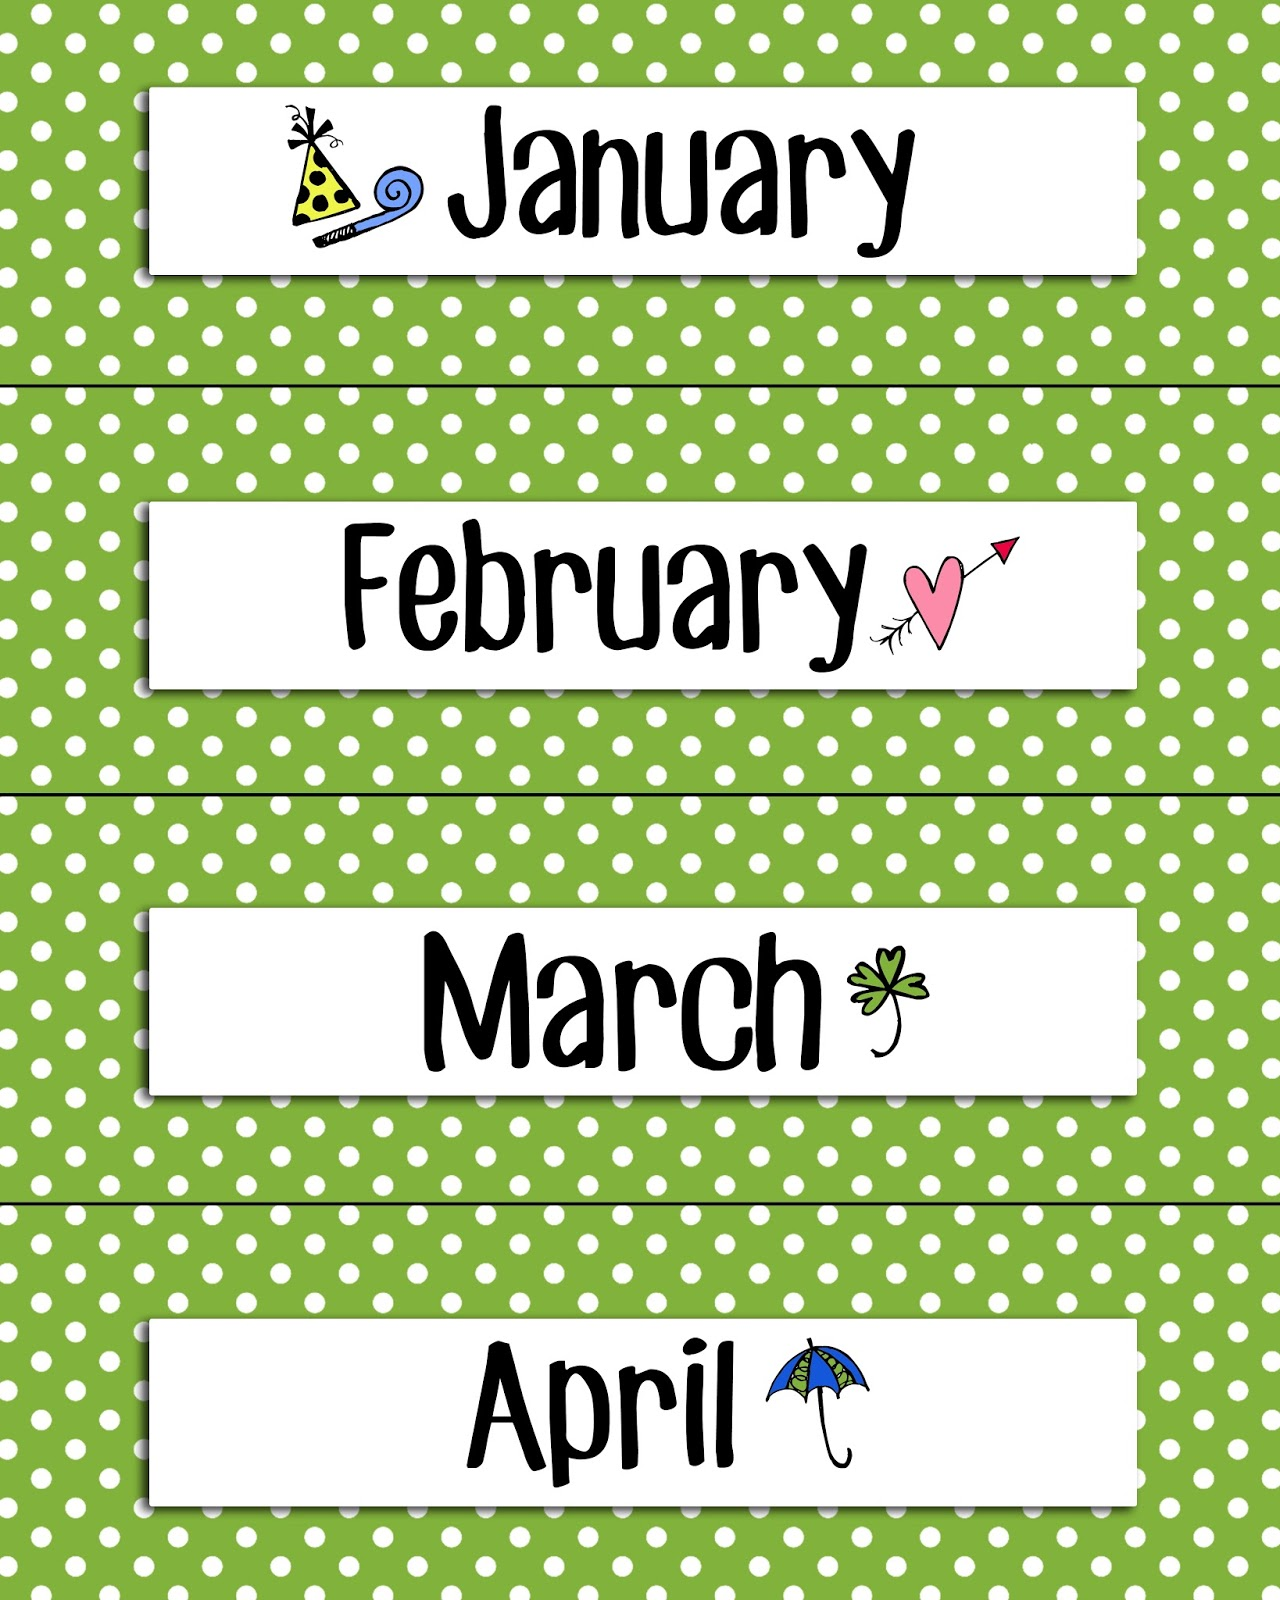 Calendar Monthly Headers : Magic markers calendar headers